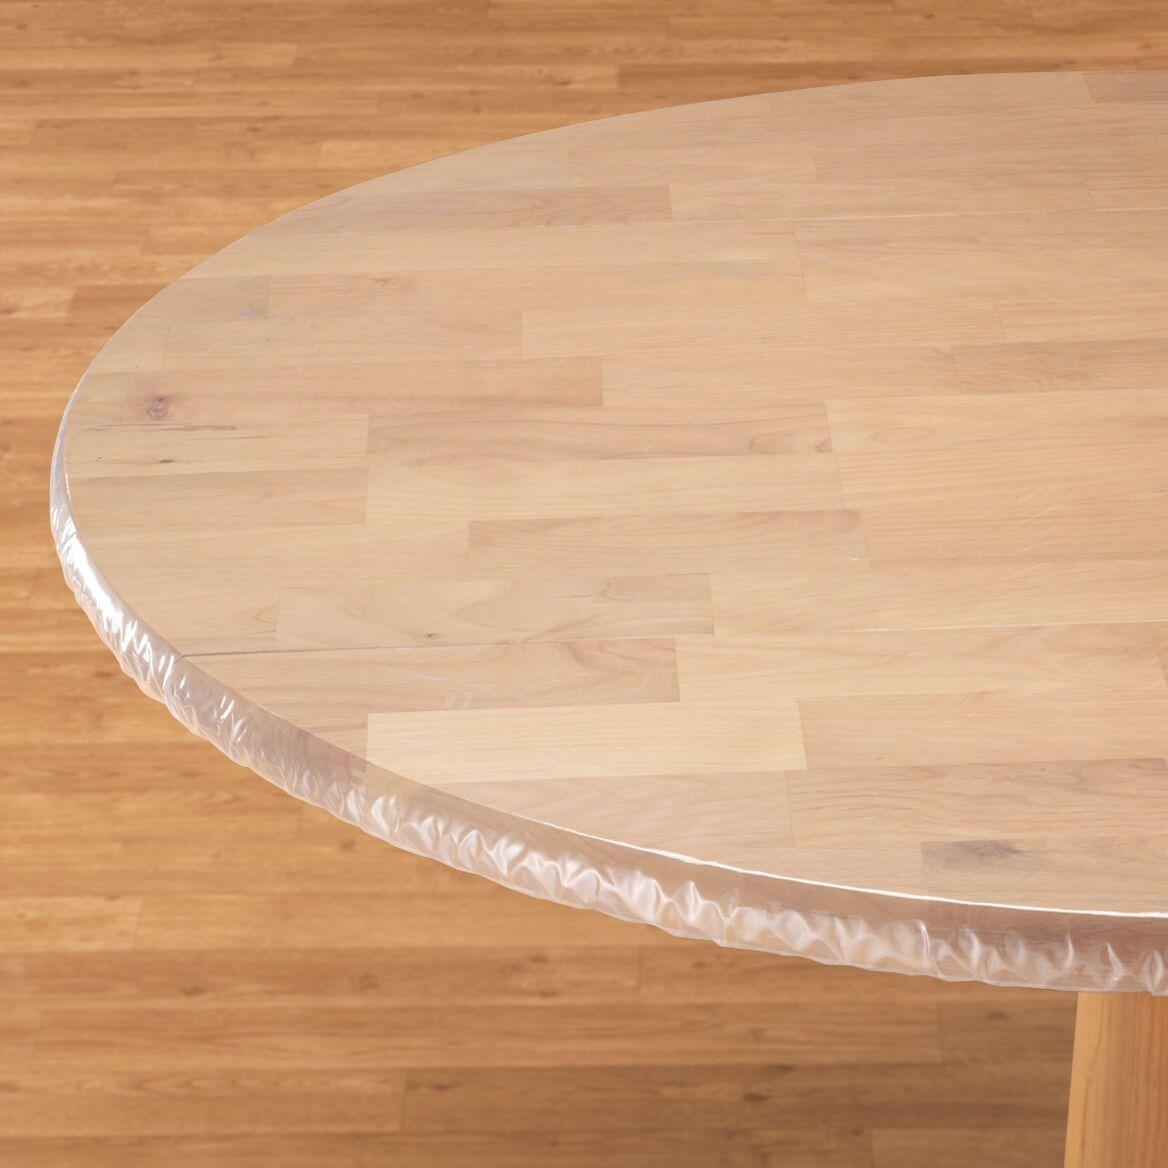 Clear Vinyl Elasticized Table Cover-344625